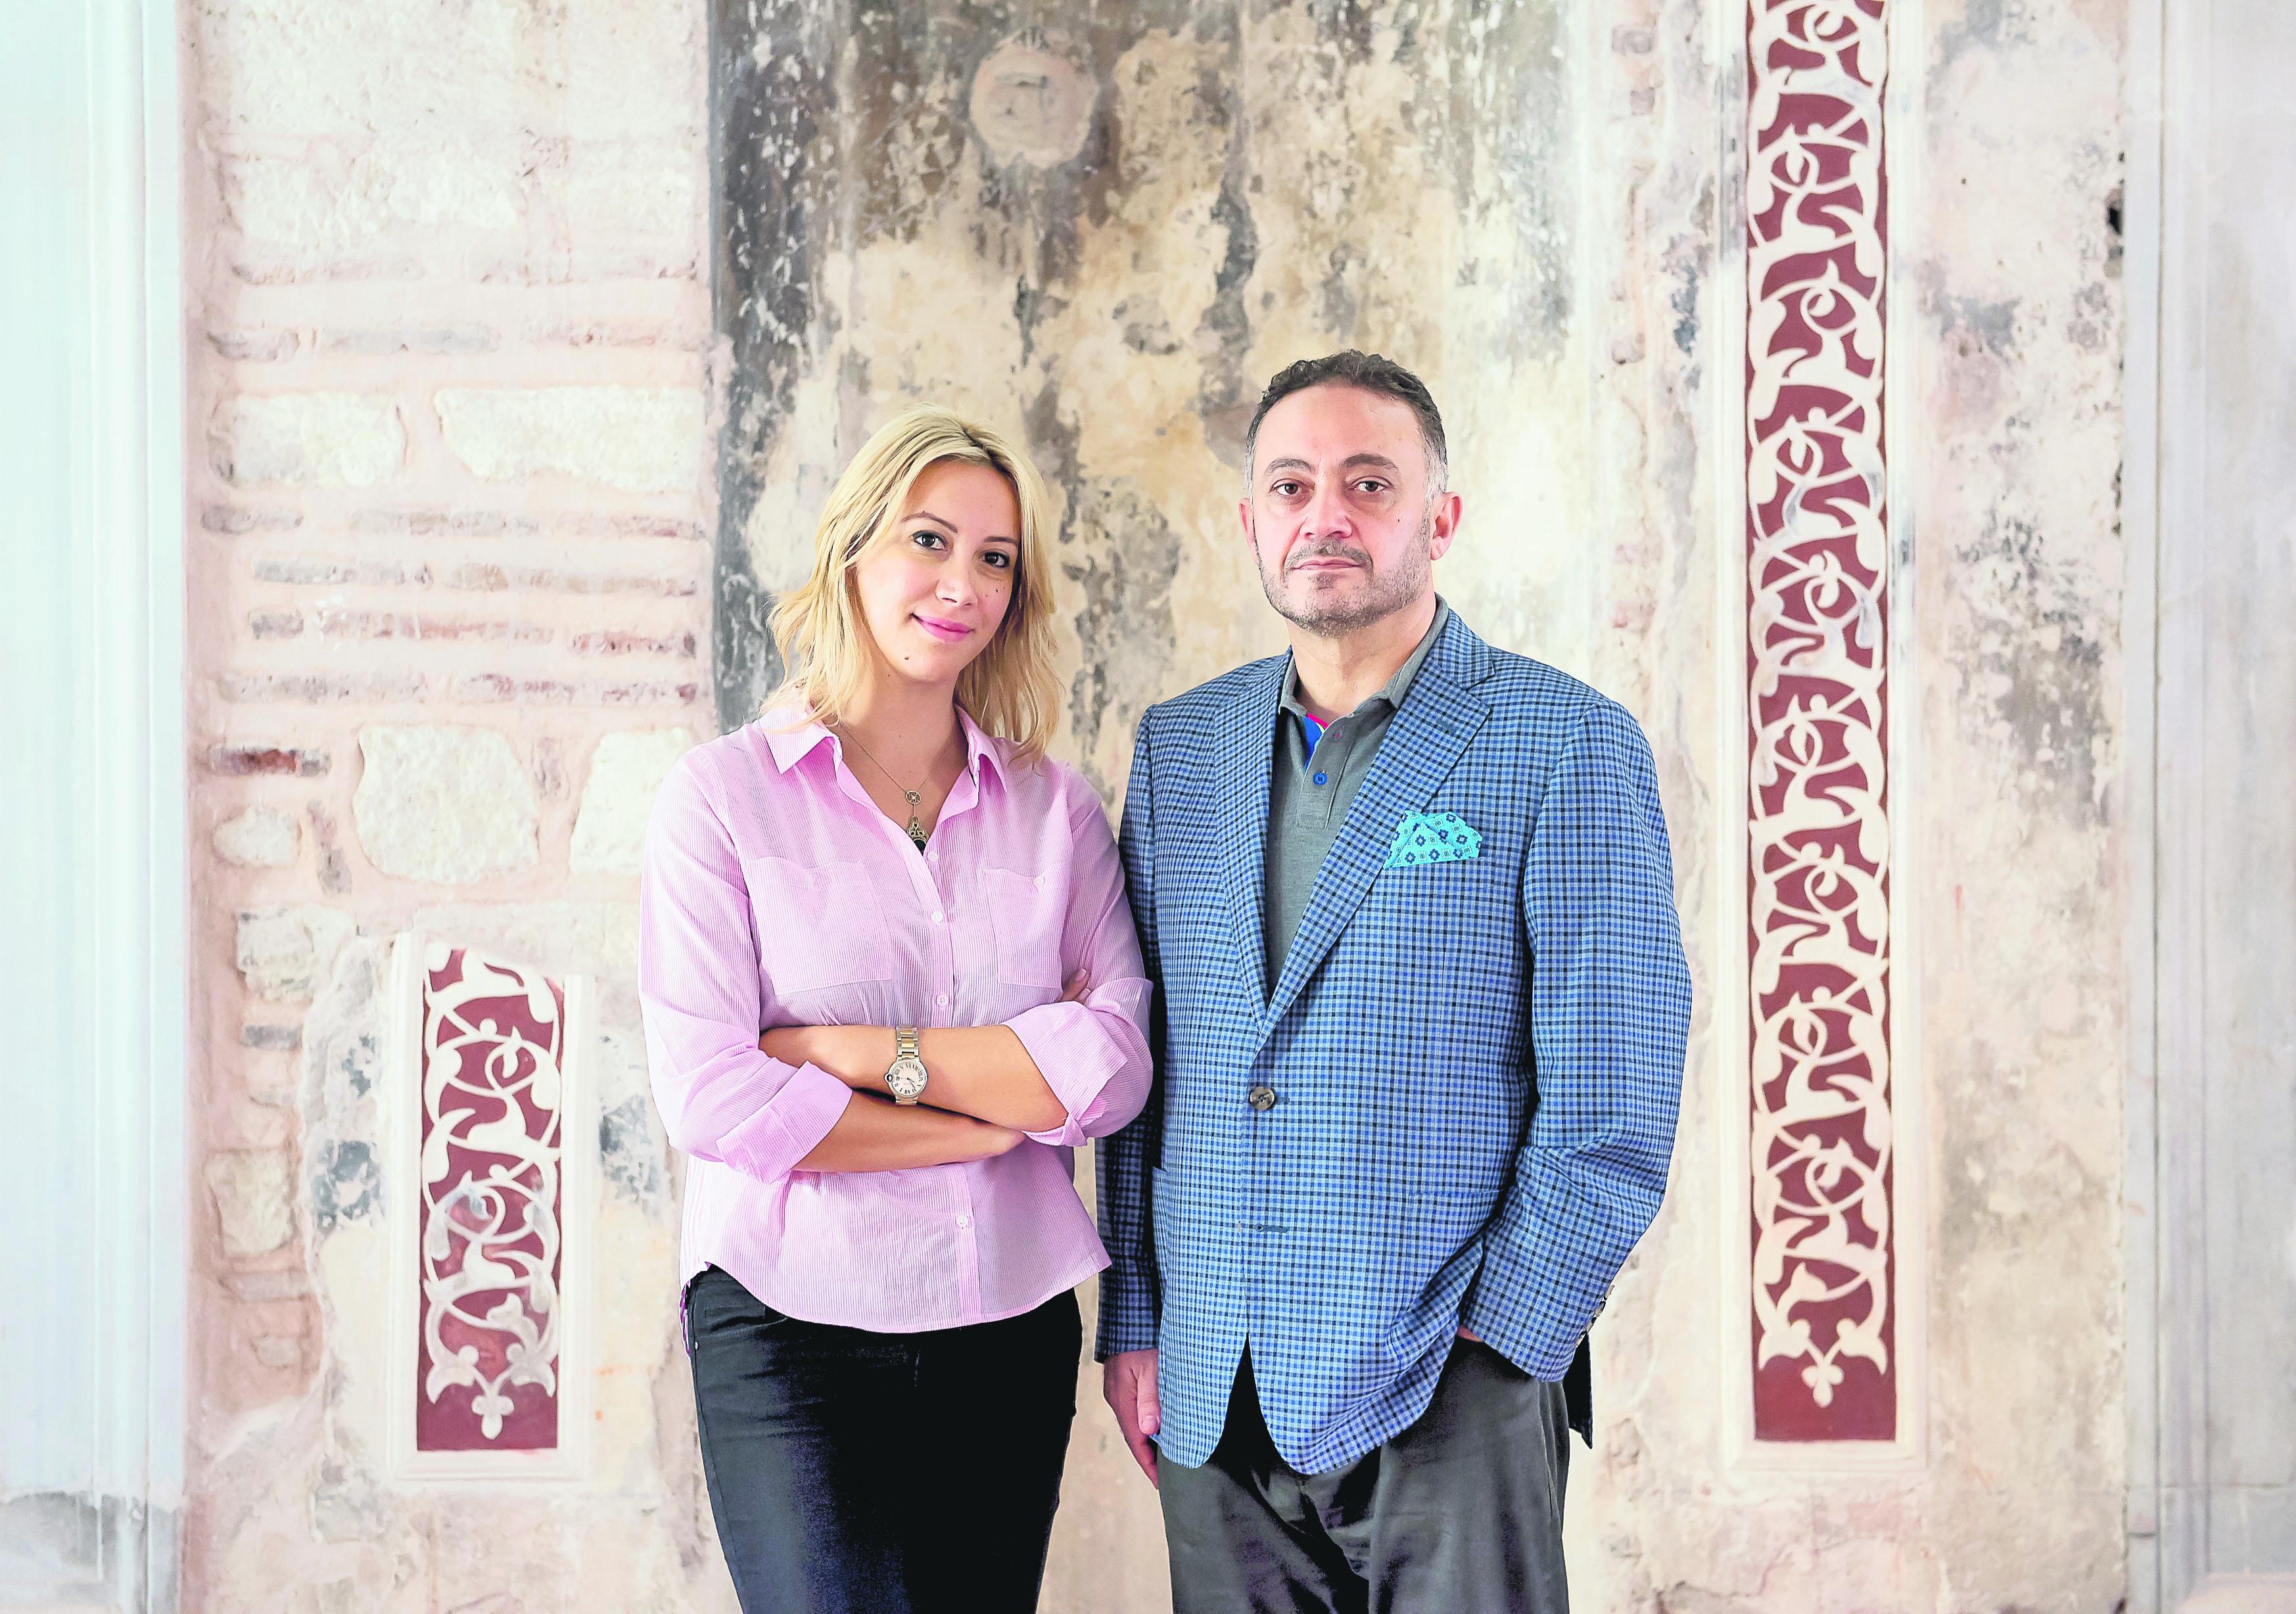 Burçu Aldinç (L) conducted an interview about the museum project with calligrapher Mehmet Çebi (R).